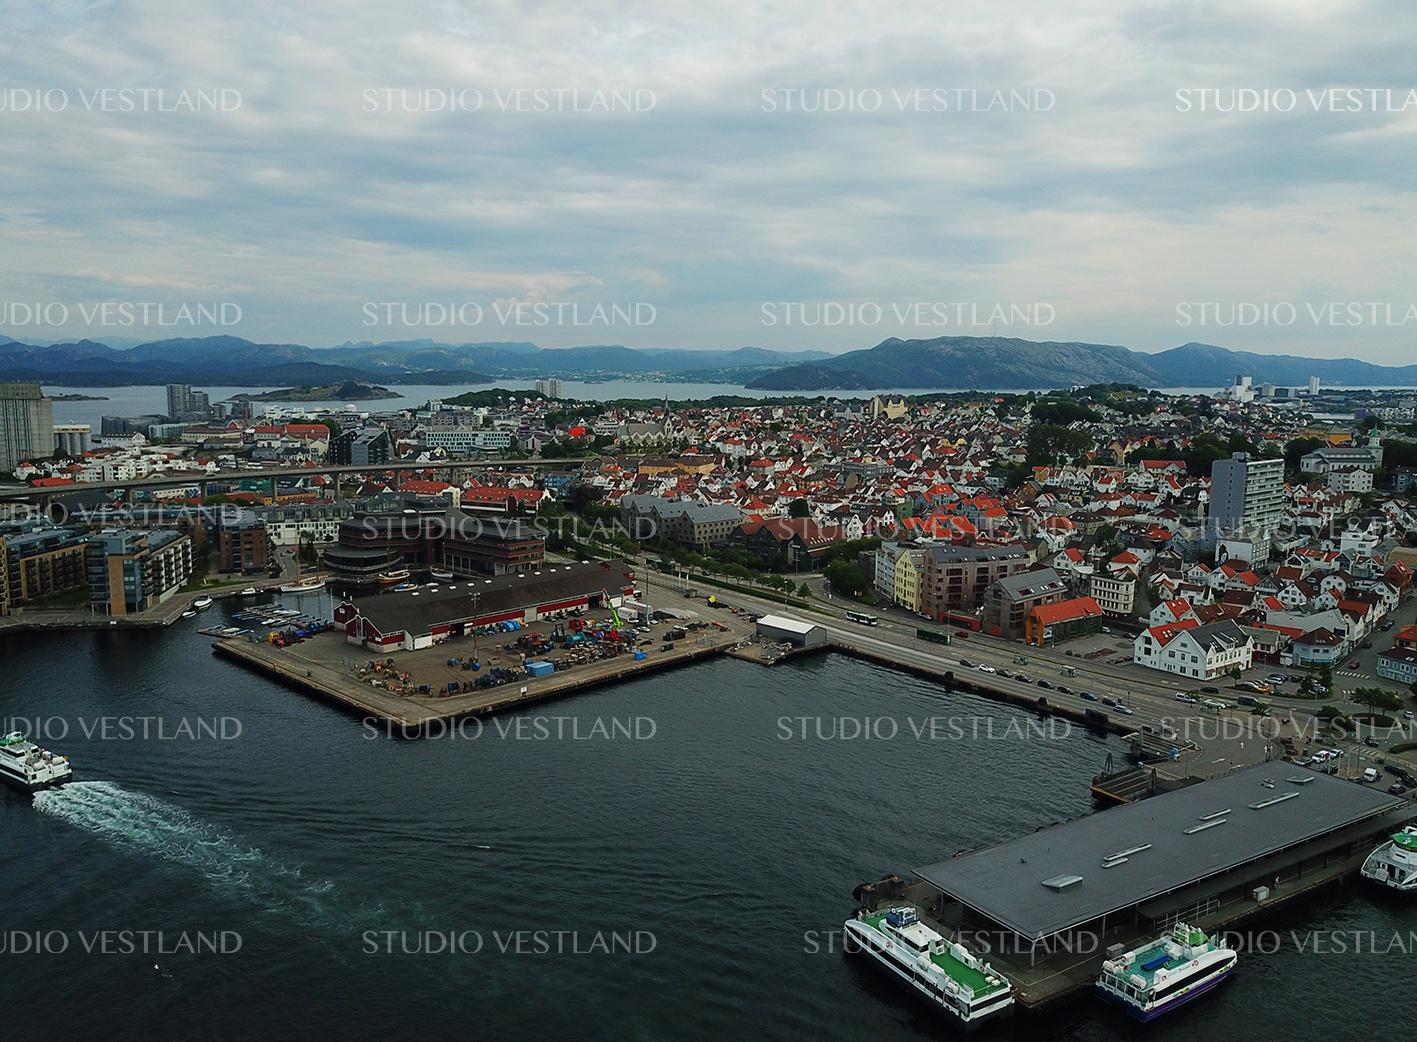 Studio Vestland - Stavanger 22